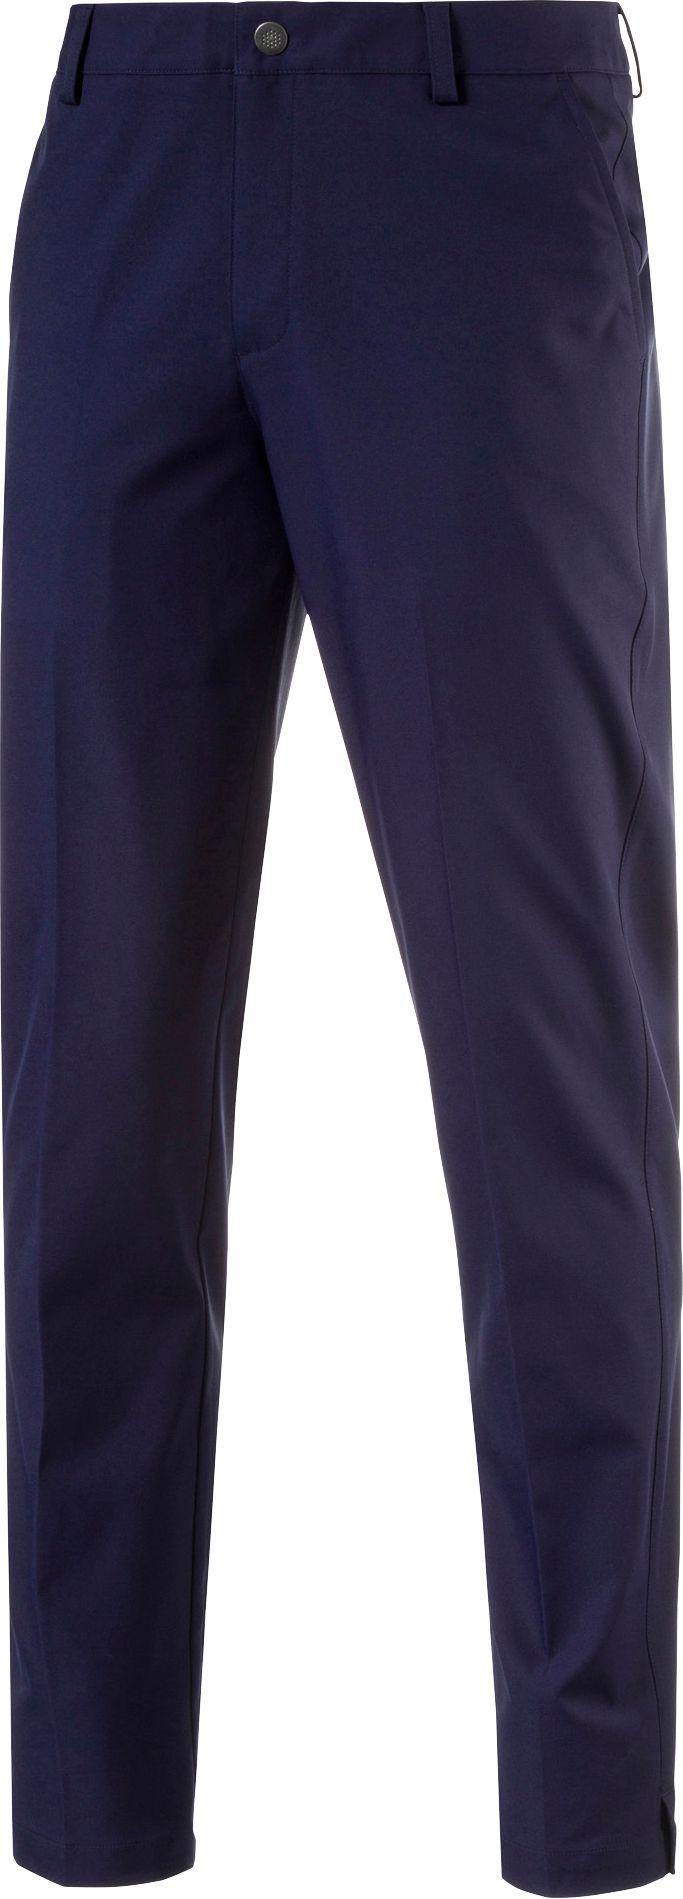 puma golf pants. puma men\u0027s essential pounce golf pants puma